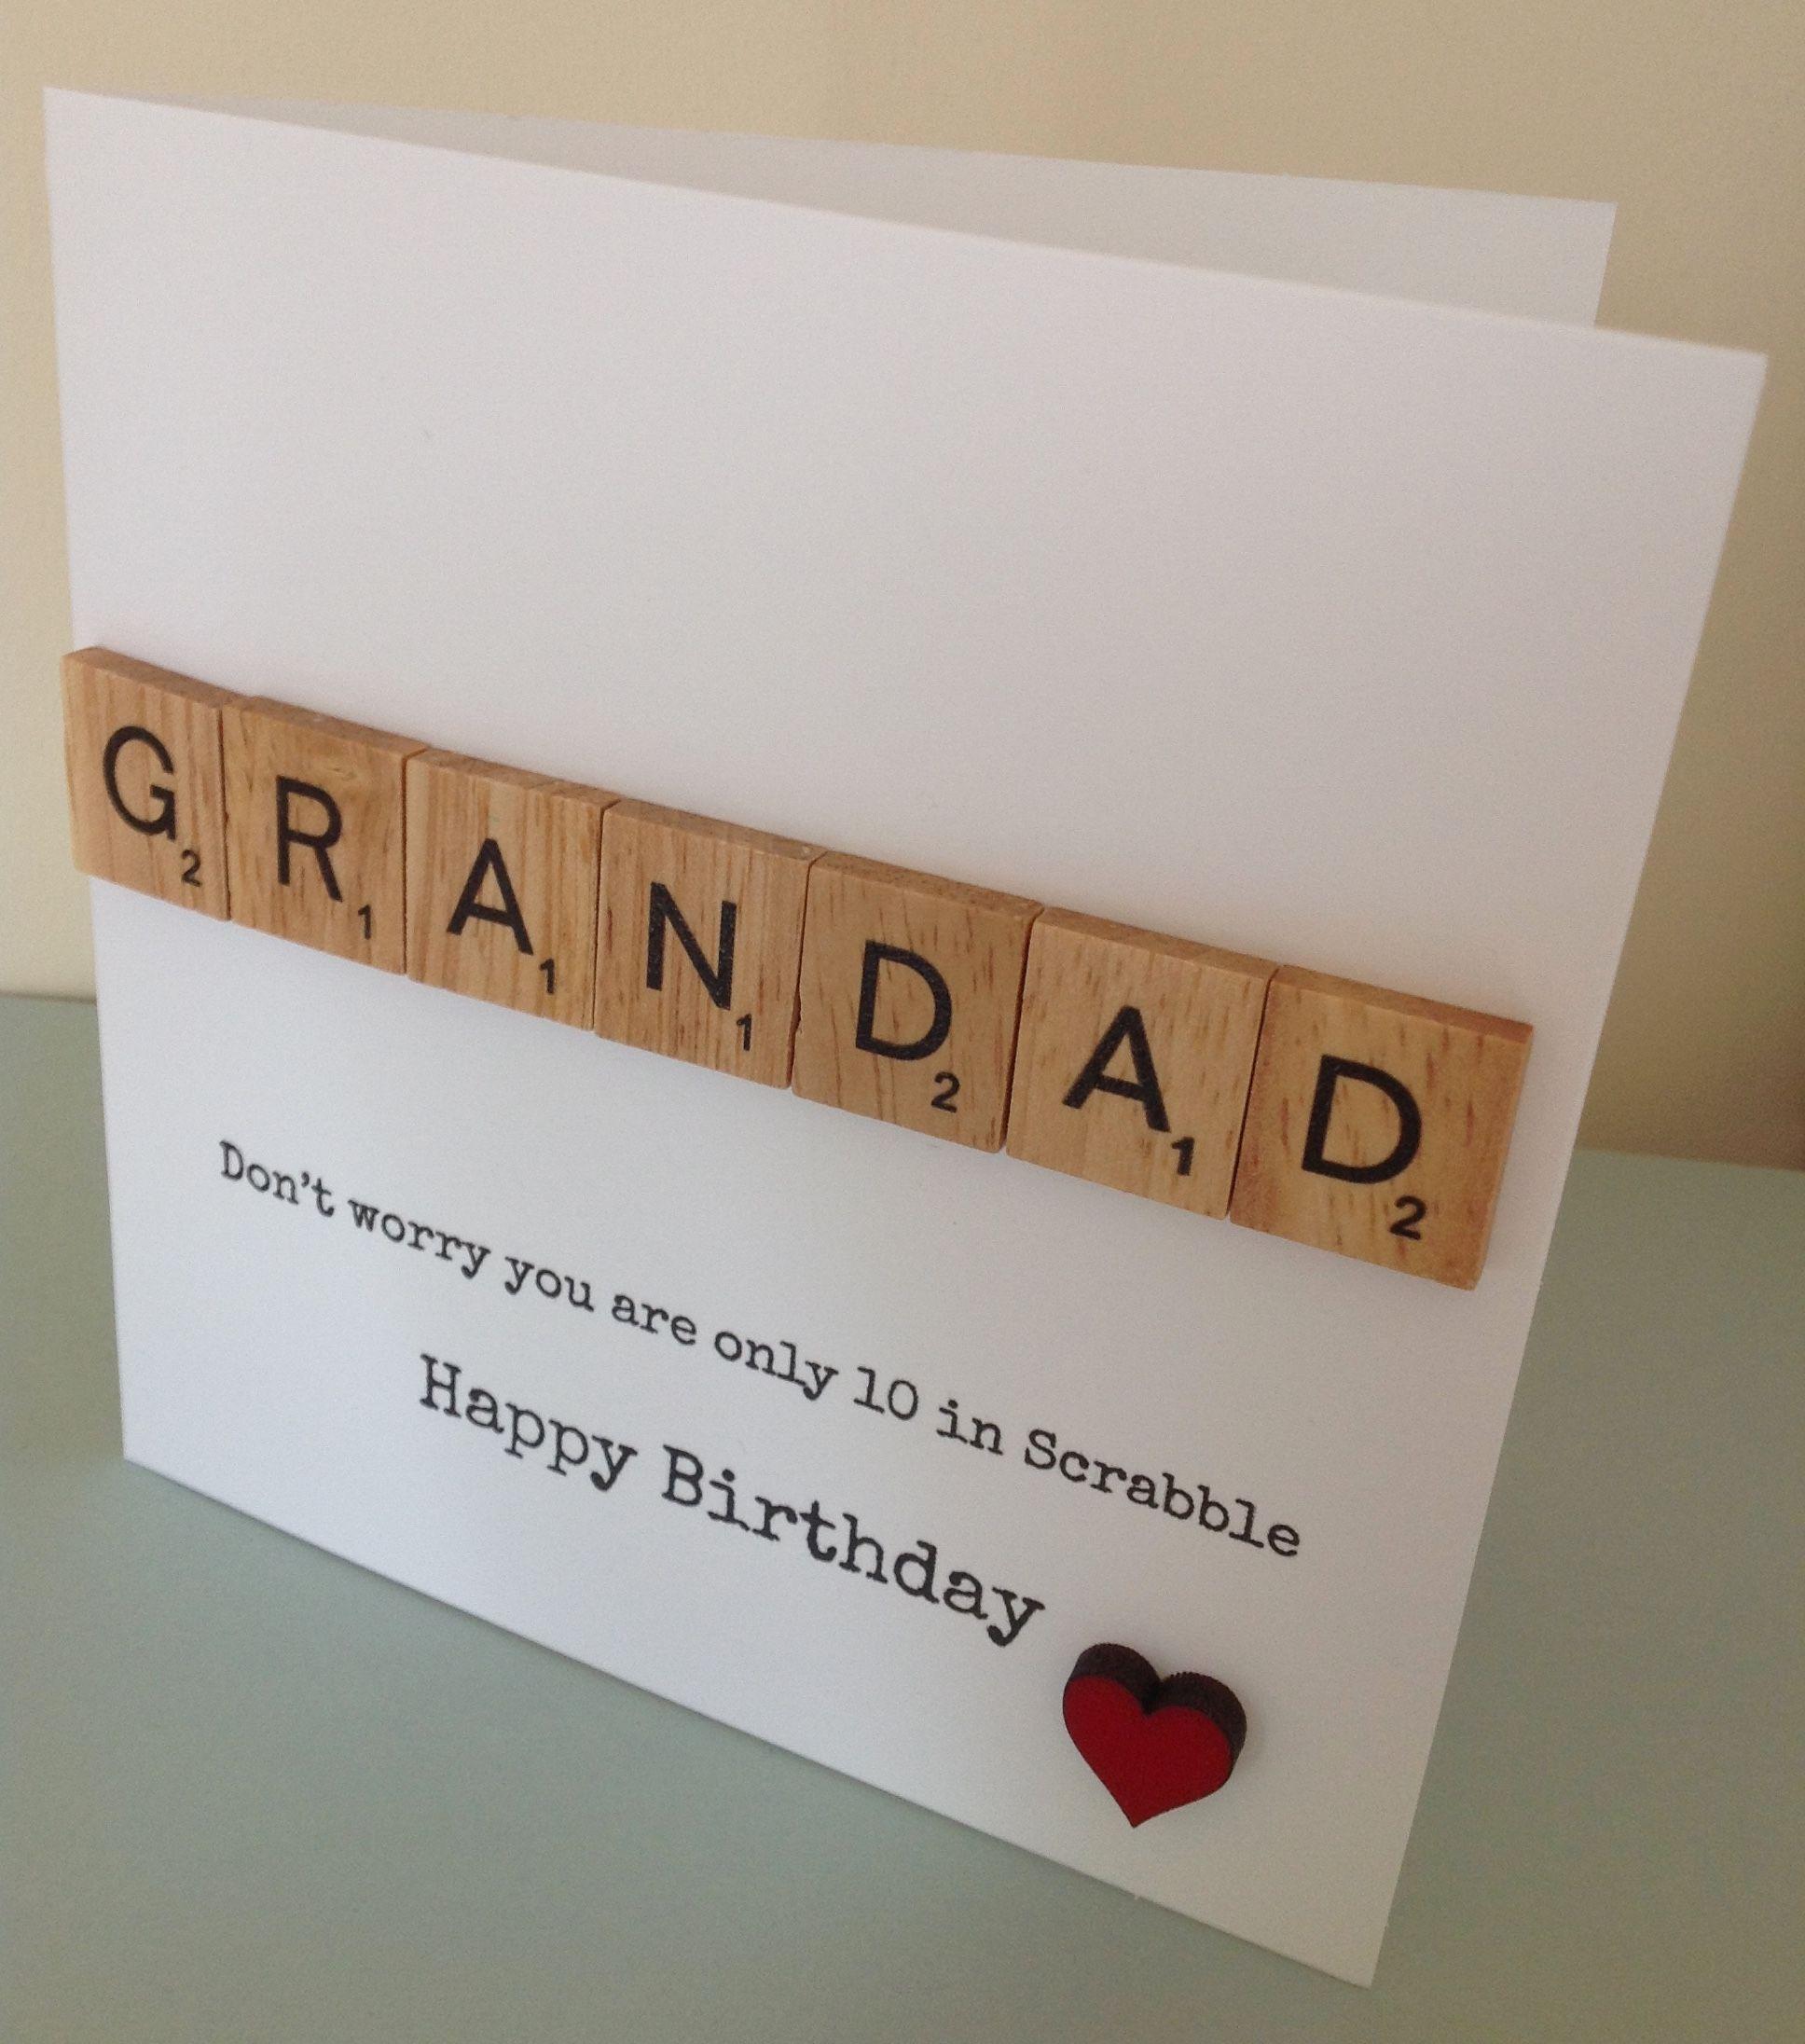 Grandad Birthday Card Facebook FunkyjunkUpcycledUK